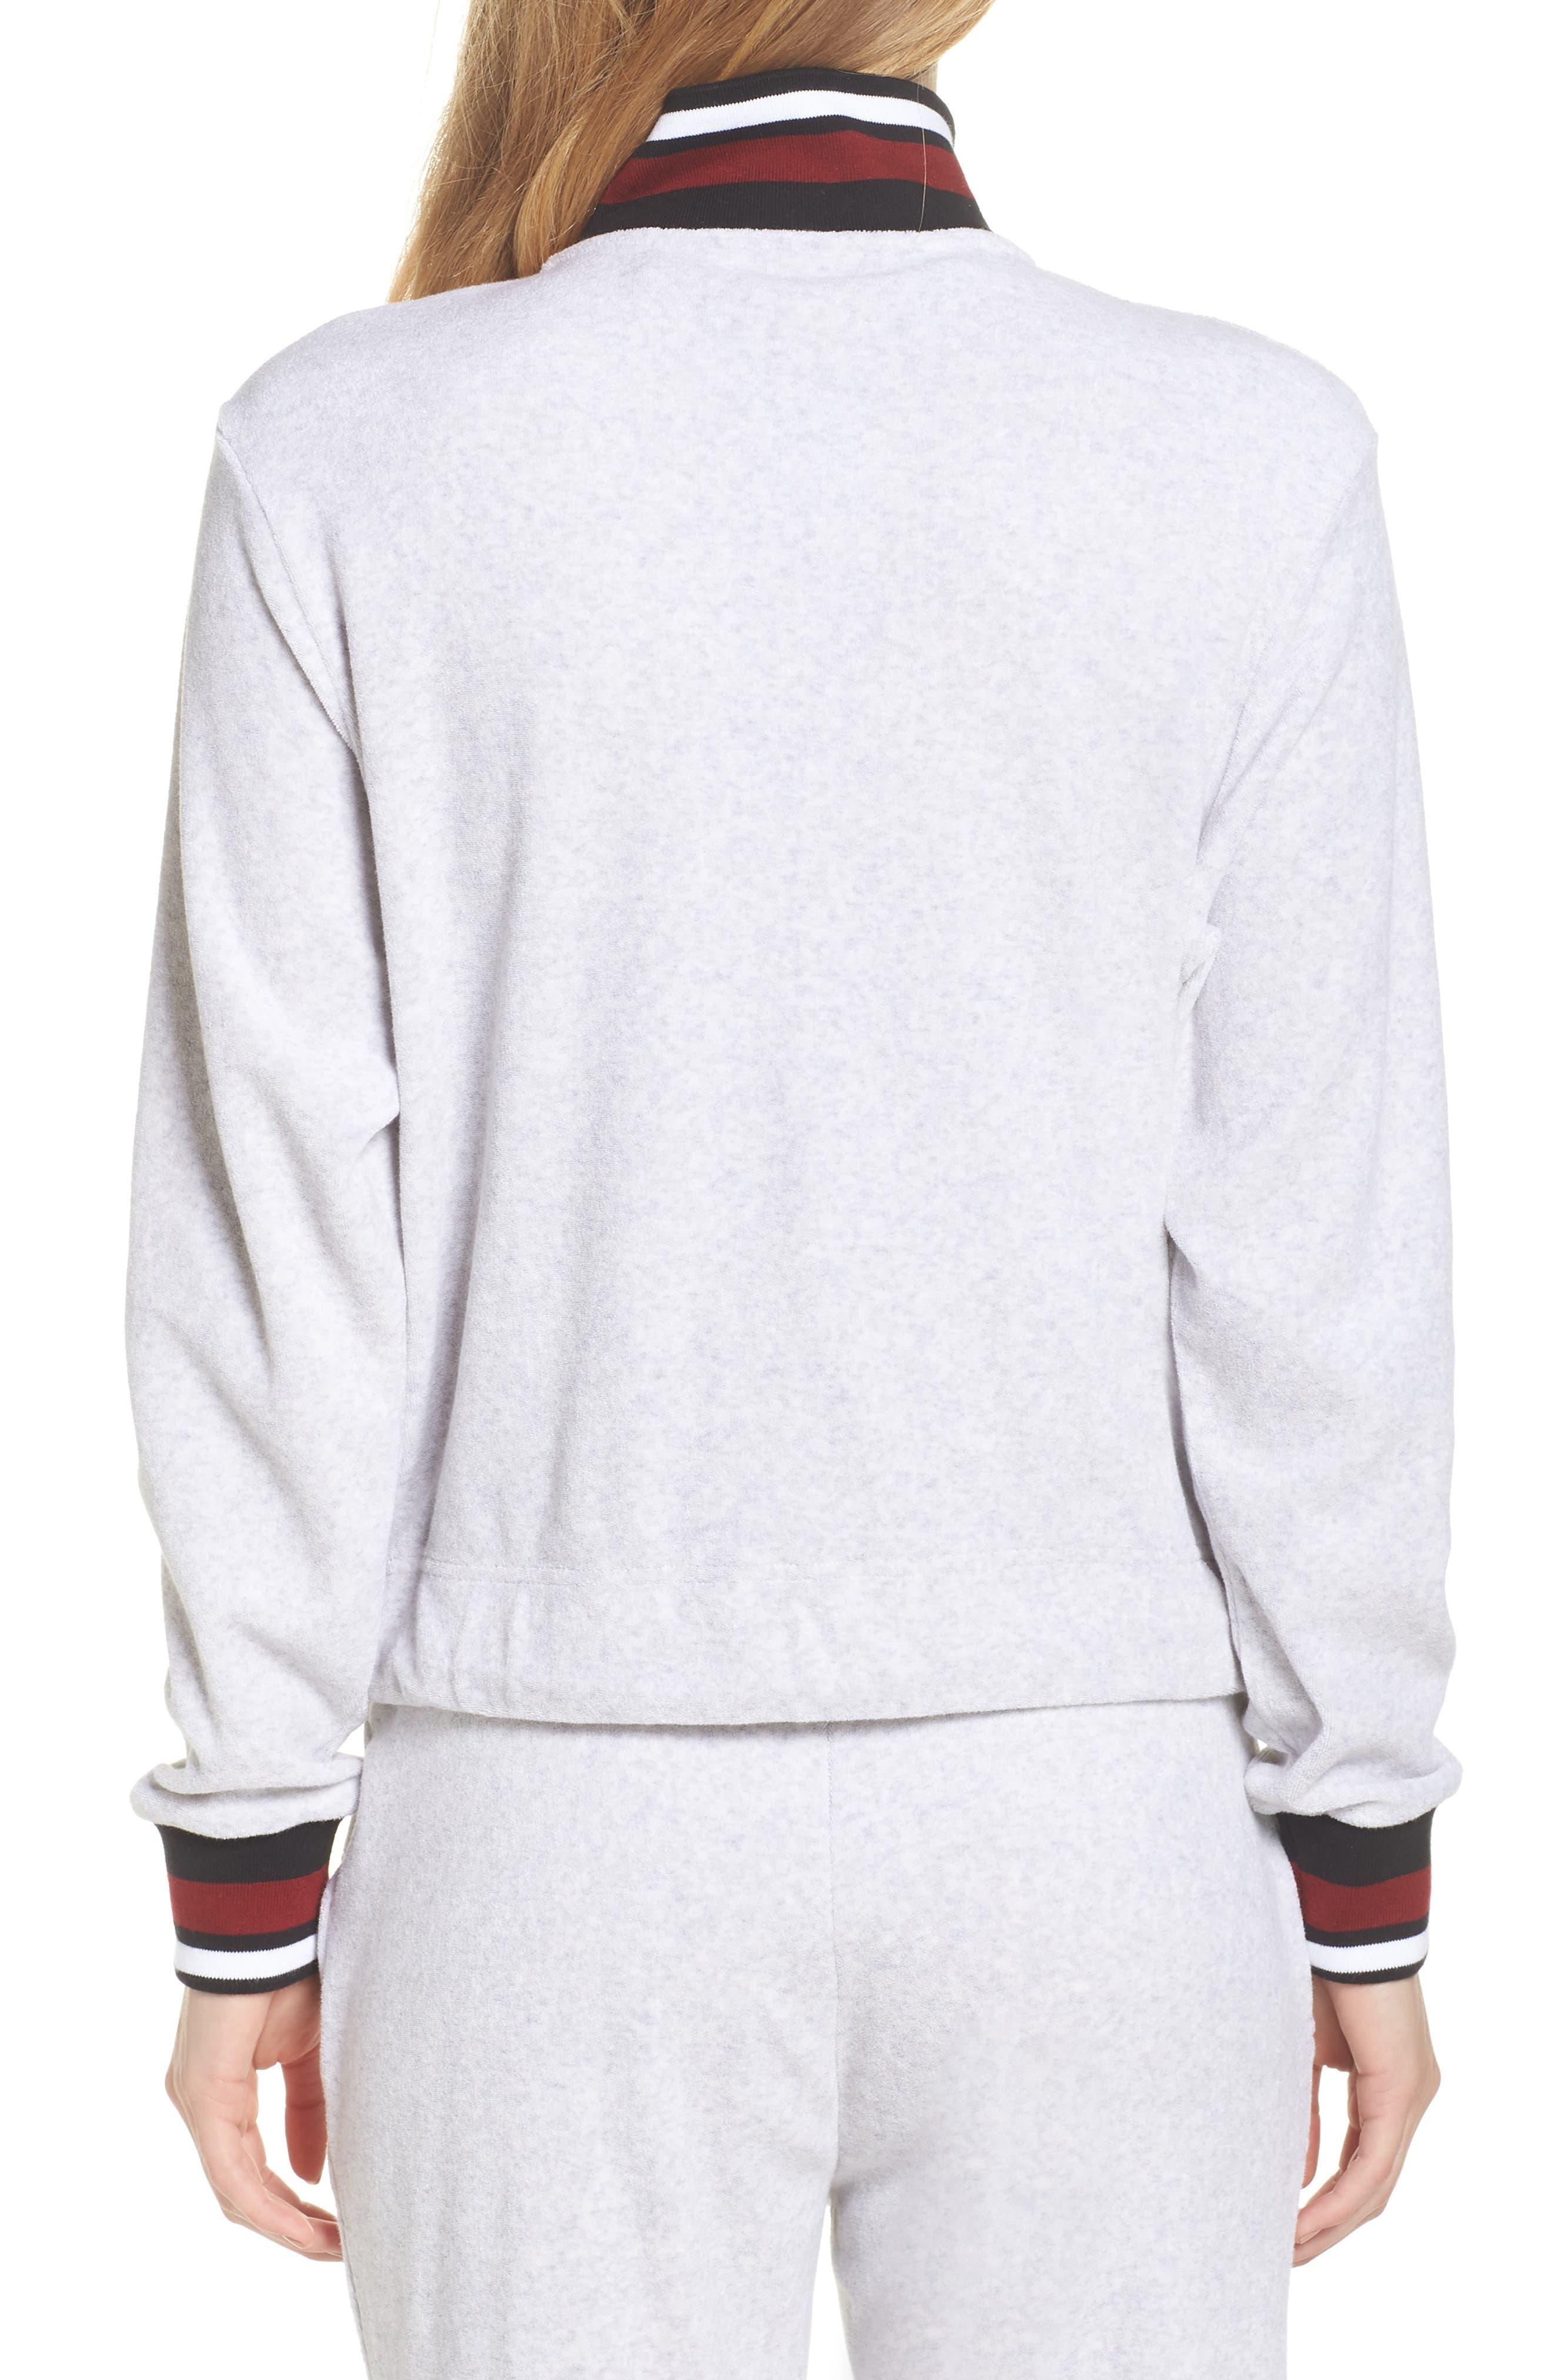 Sportswear French Terry Jacket,                             Alternate thumbnail 2, color,                             Birch Heather/ White/ Black